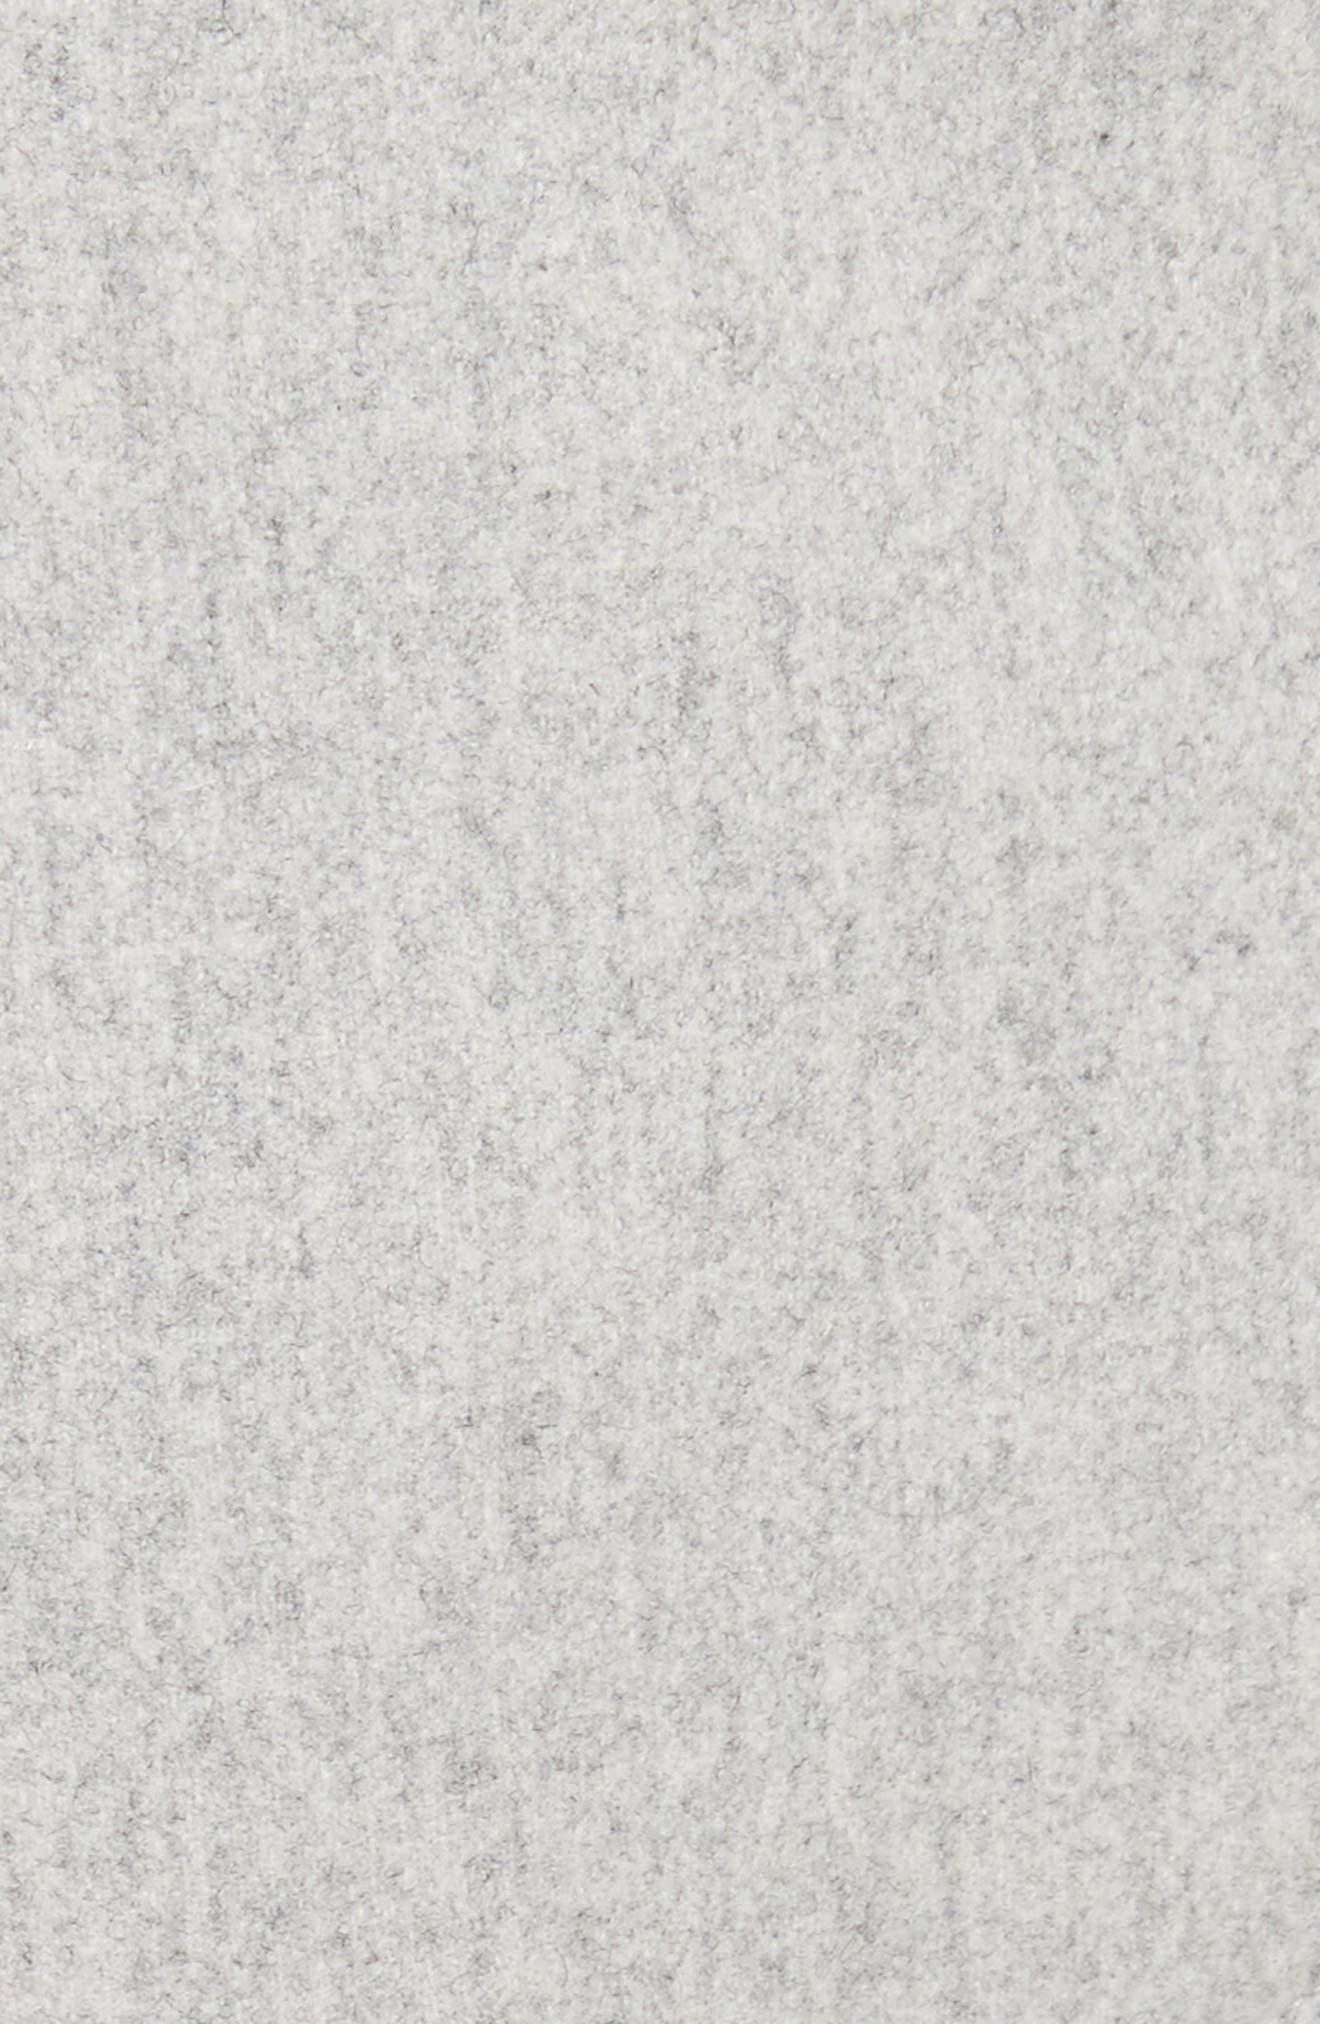 Mélange Wool Blend Trousers,                             Alternate thumbnail 4, color,                             Light Grey Melange